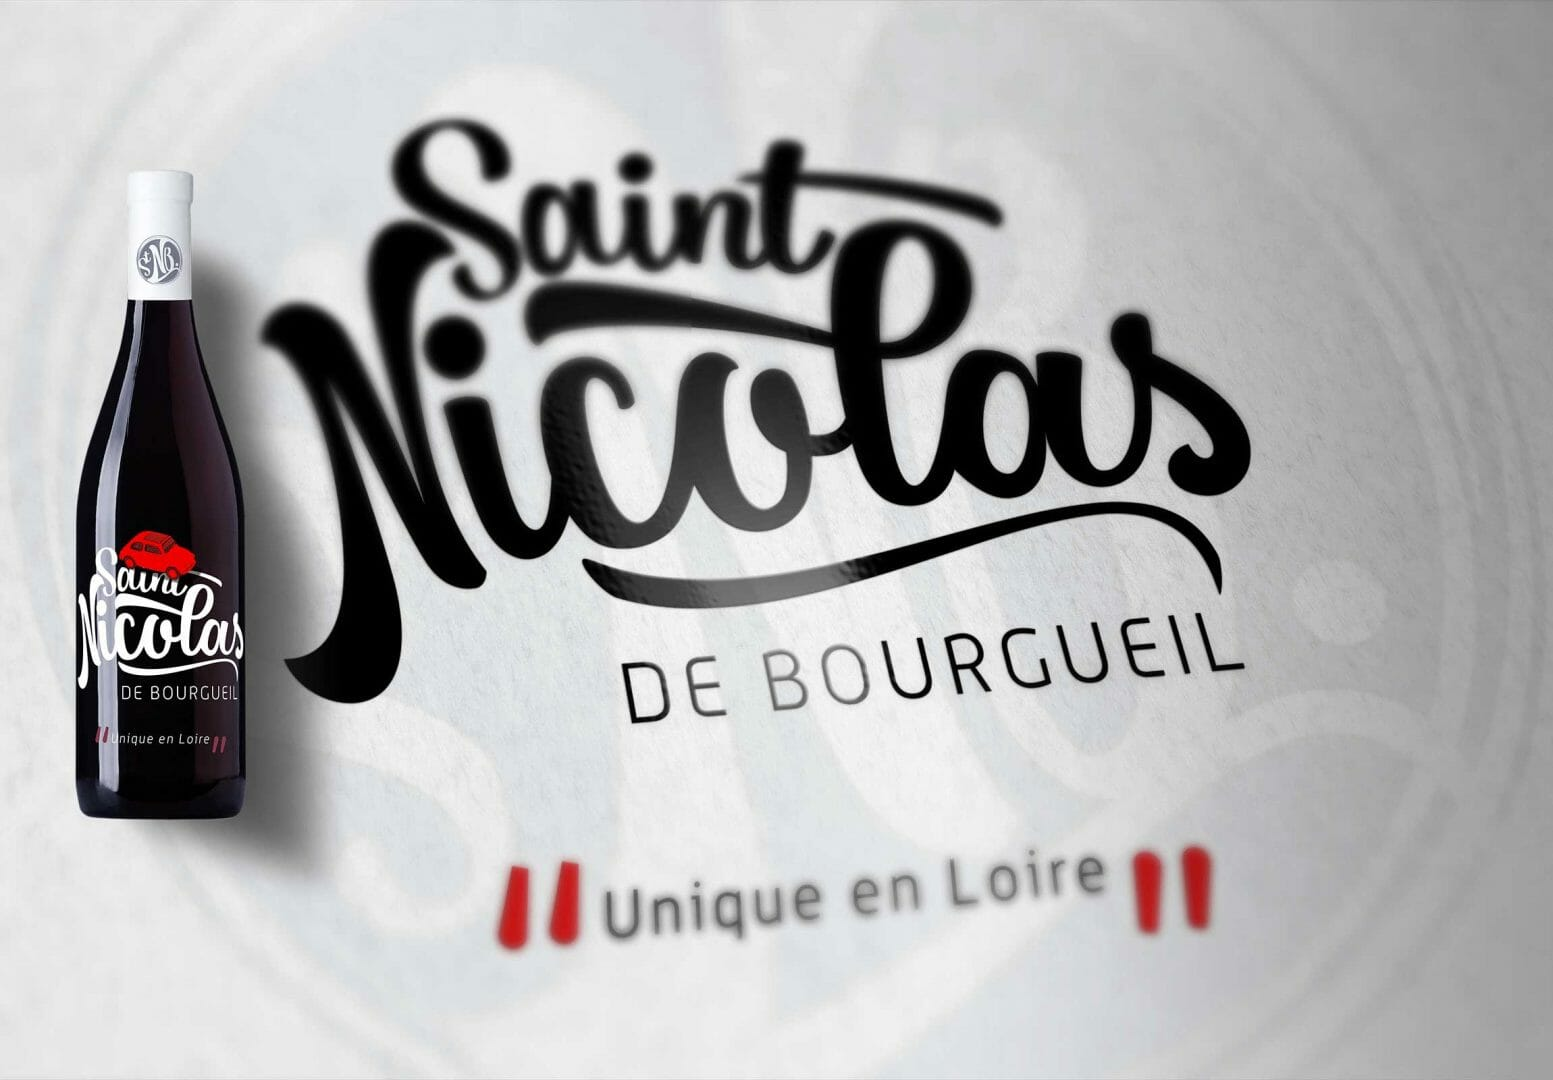 The identity of the Saint Nicolas de Bourgueil appellation